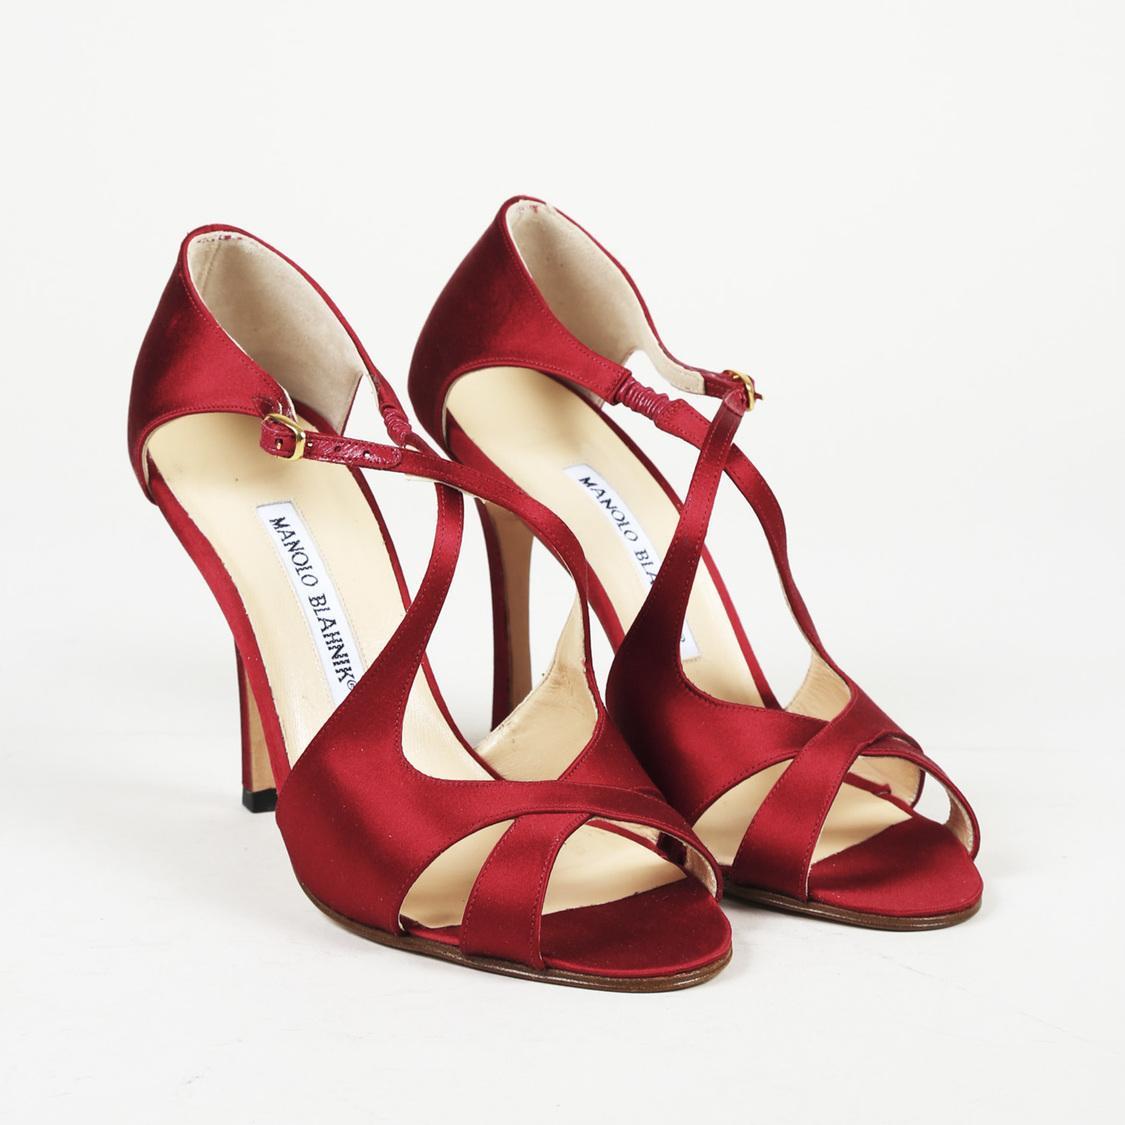 b11c8ef15a9 Lyst - Manolo Blahnik Satin Strappy Heeled Sandals in Red